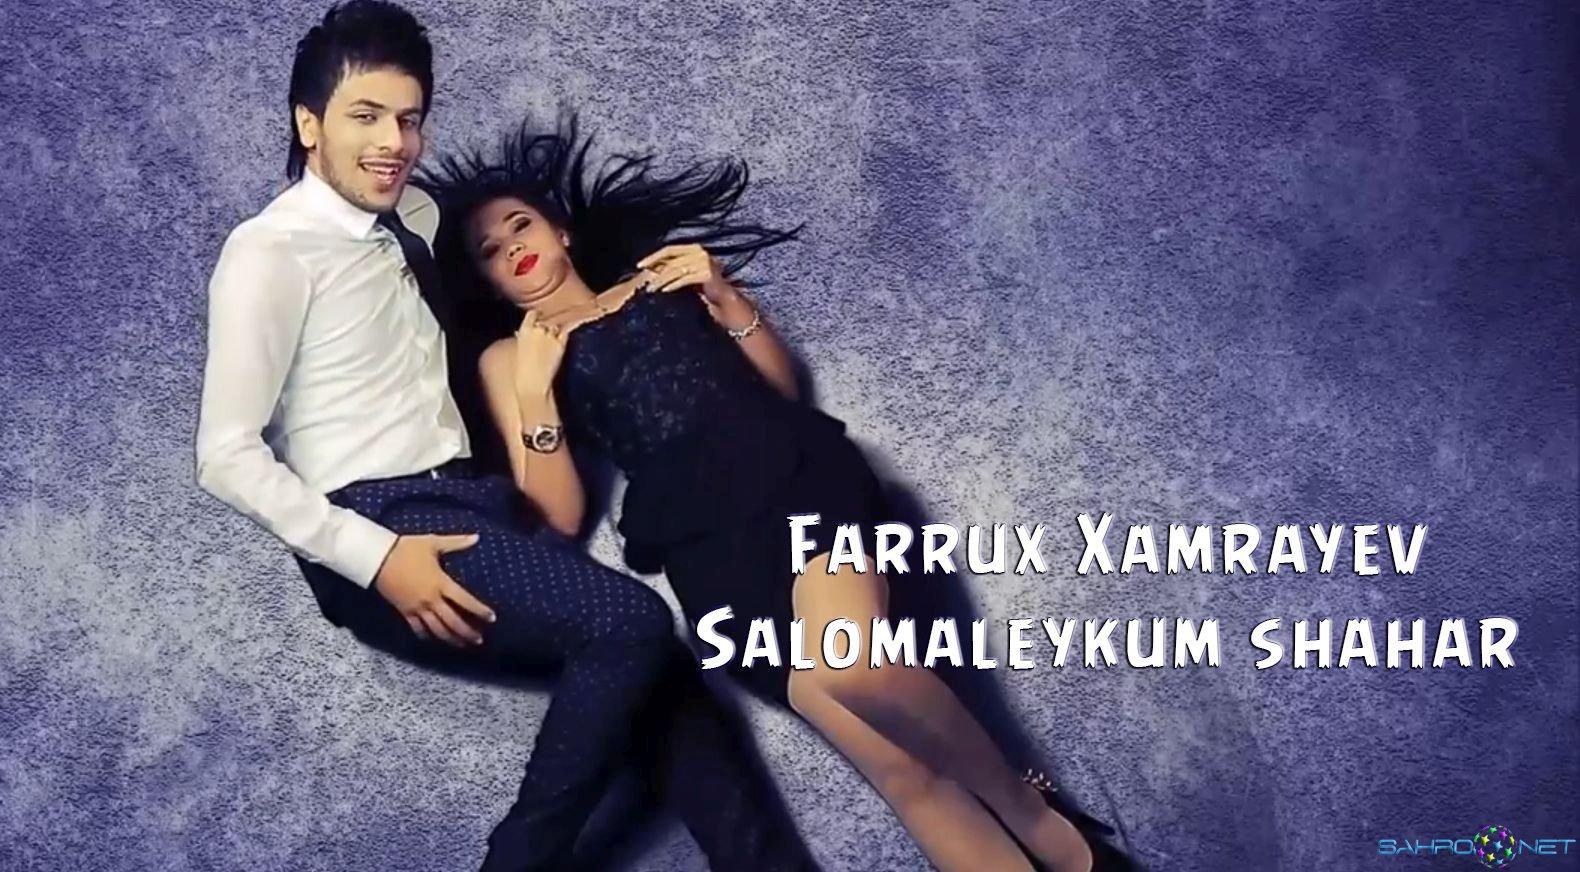 Farrux Xamrayev 2015 - Salomaleykum shahar Янги Узбек Кино Скачать 2015